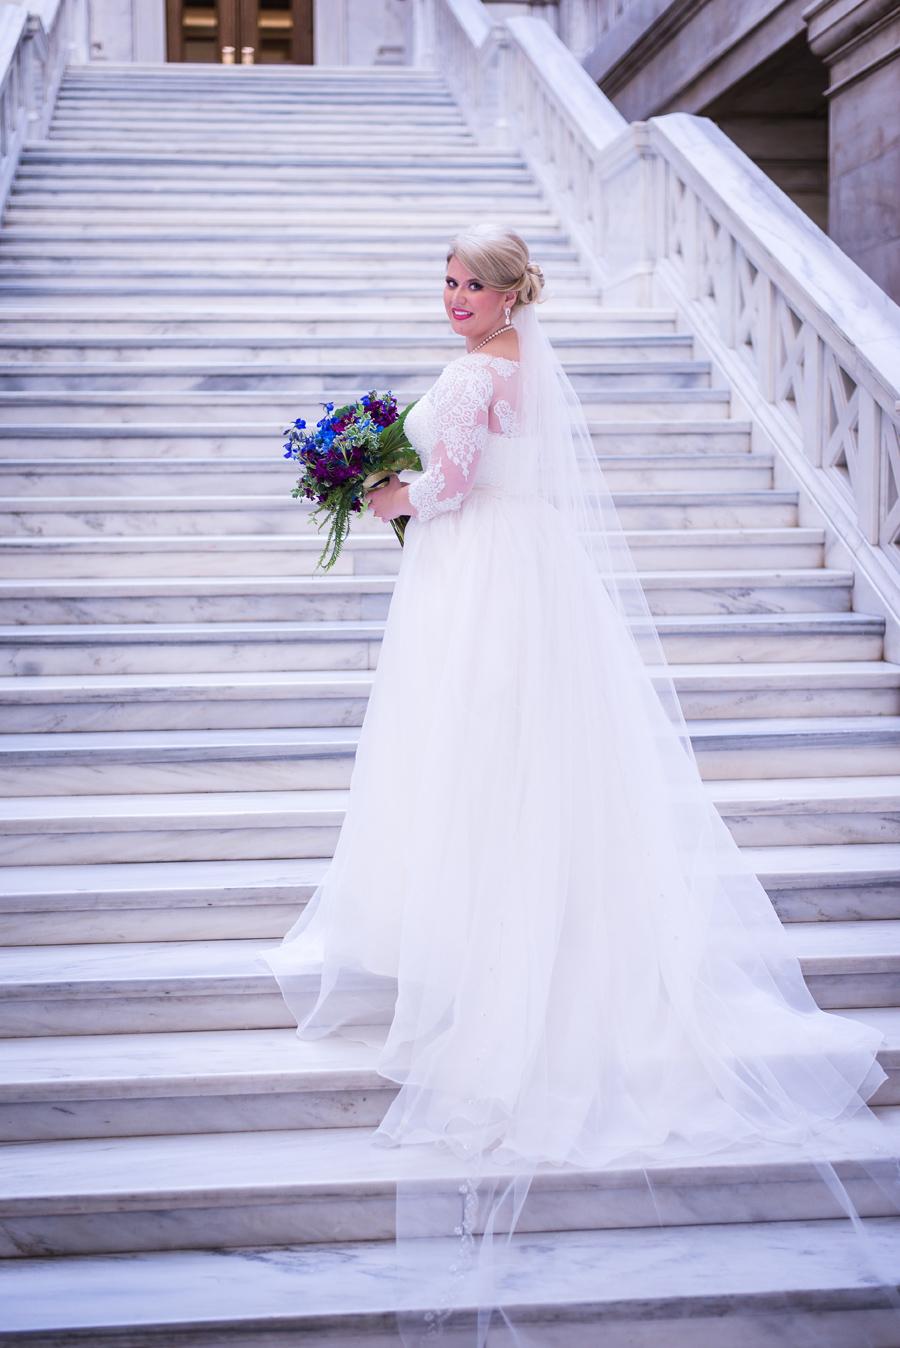 Wedding Dress Shops In Arkansas 67 Simple Such a sweet wedding